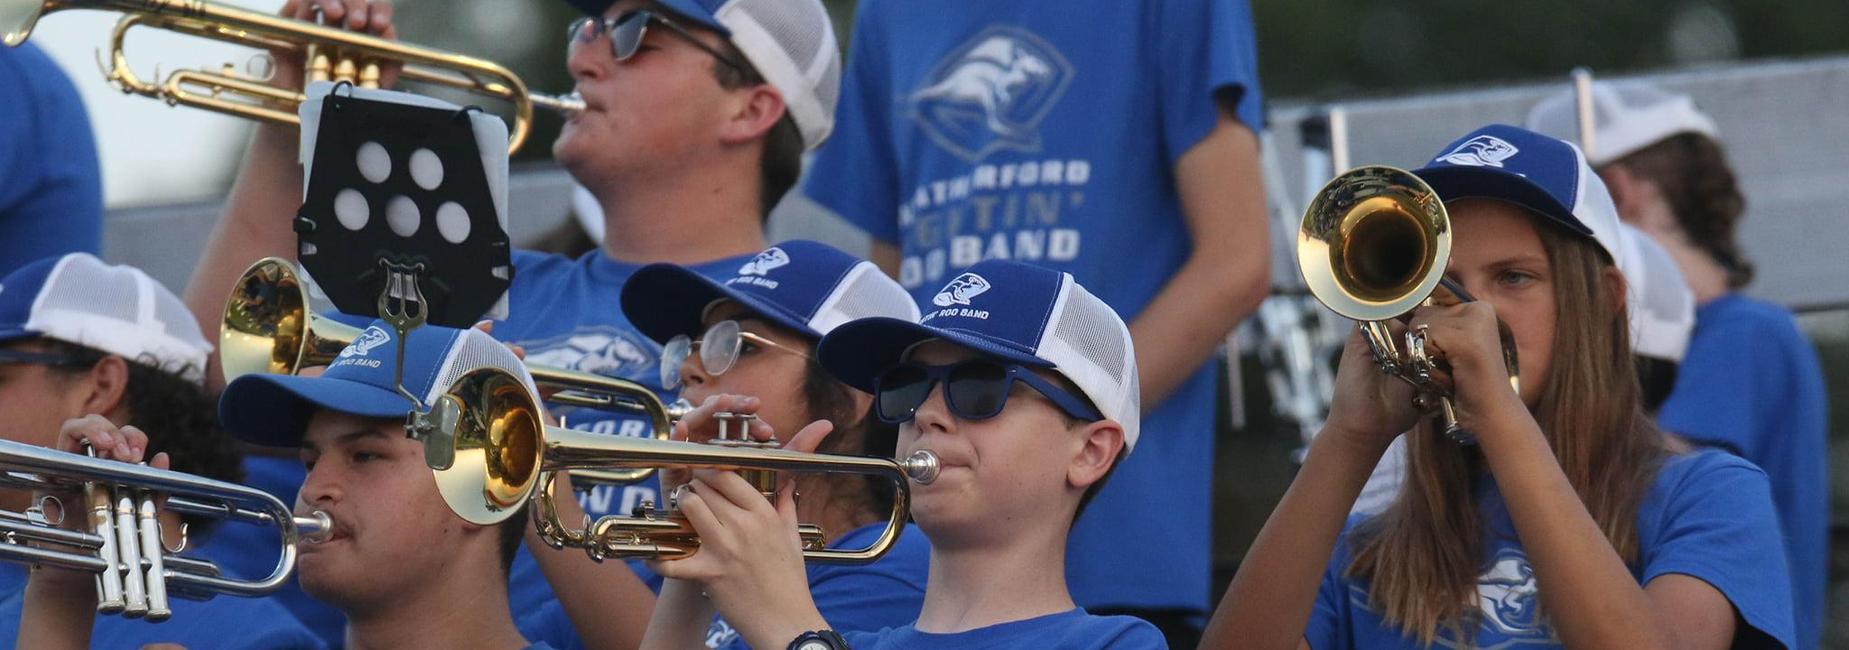 Band students playing instruments at a football game